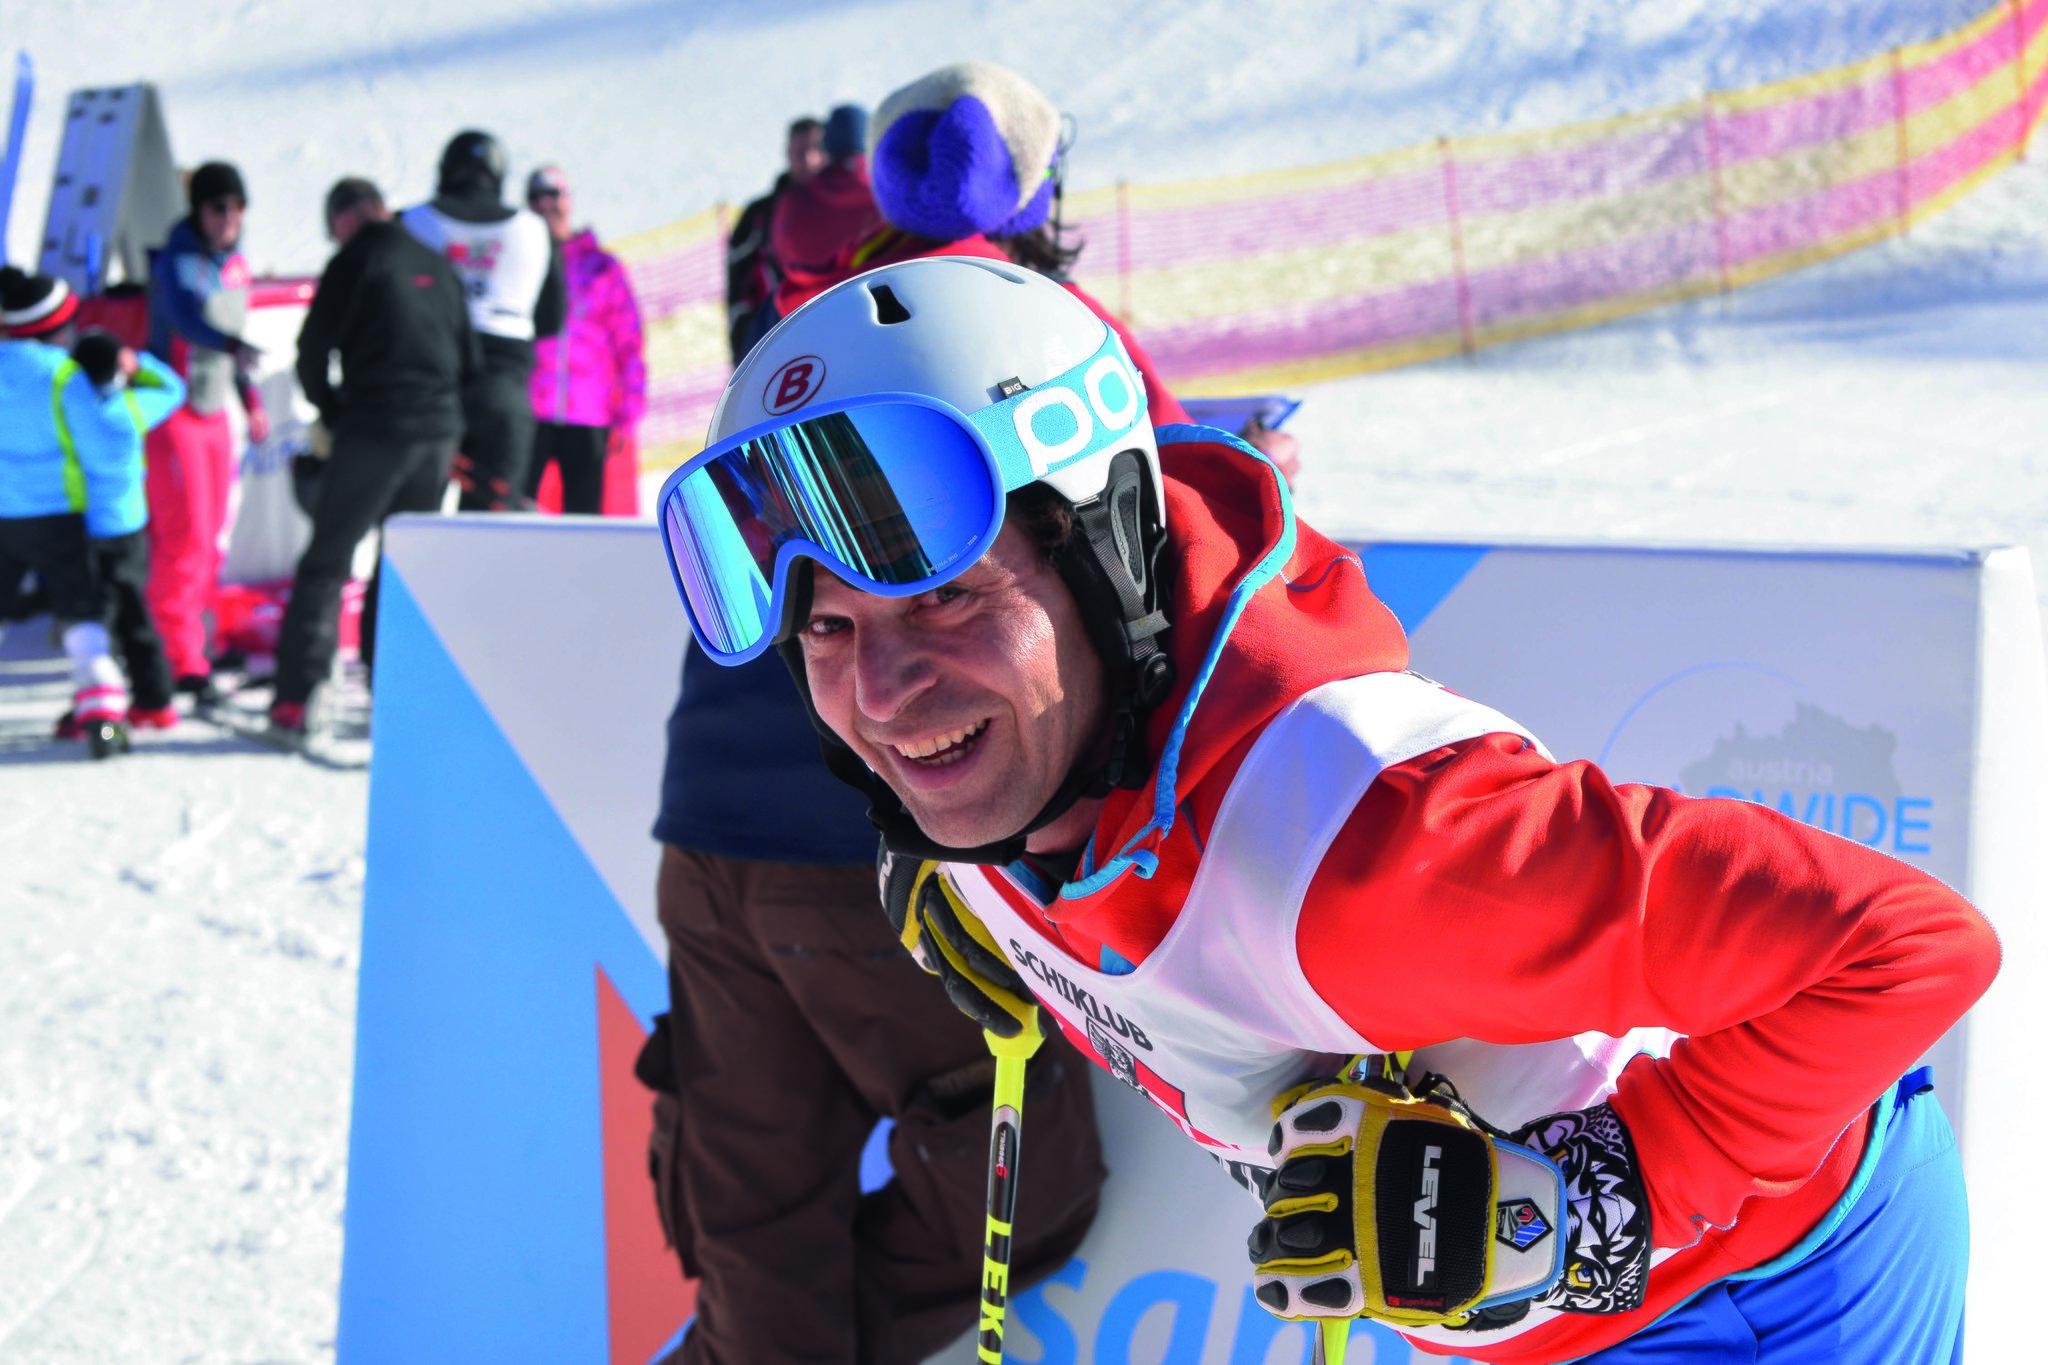 Telfer Skitag am 16.2.2020!